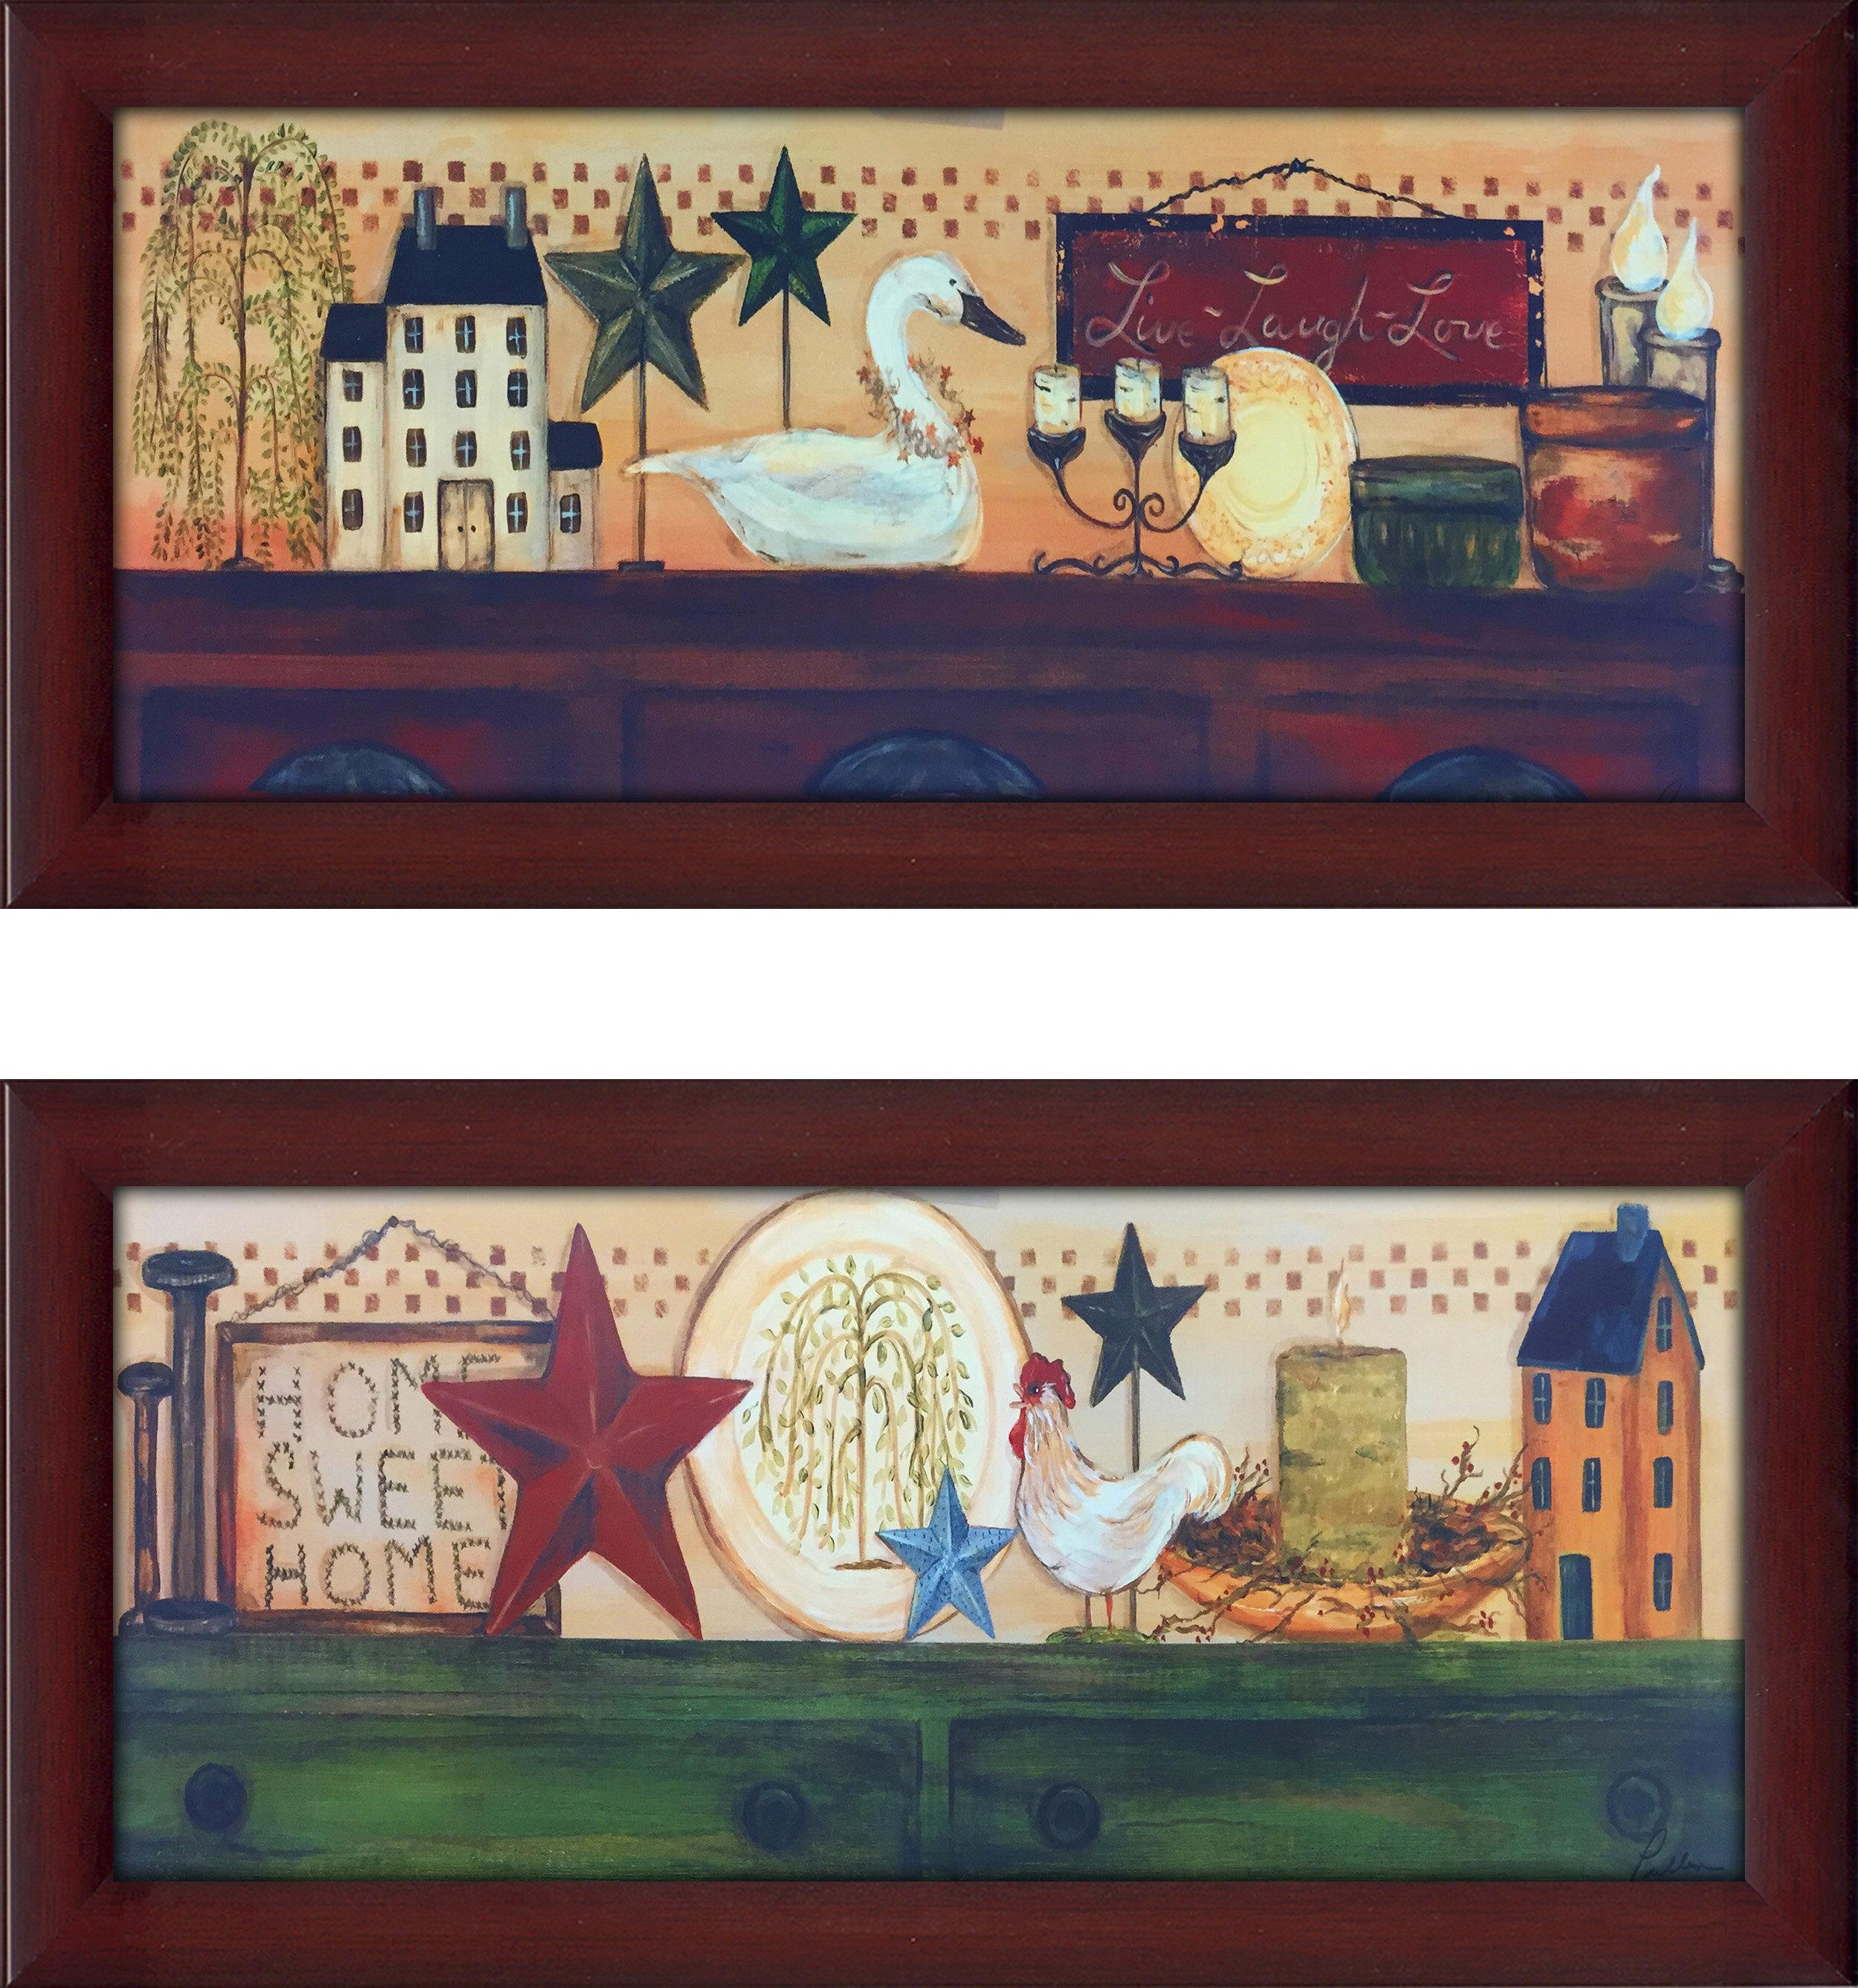 August Grove Live Laugh Love 2 Piece Framed Print Set Wayfair